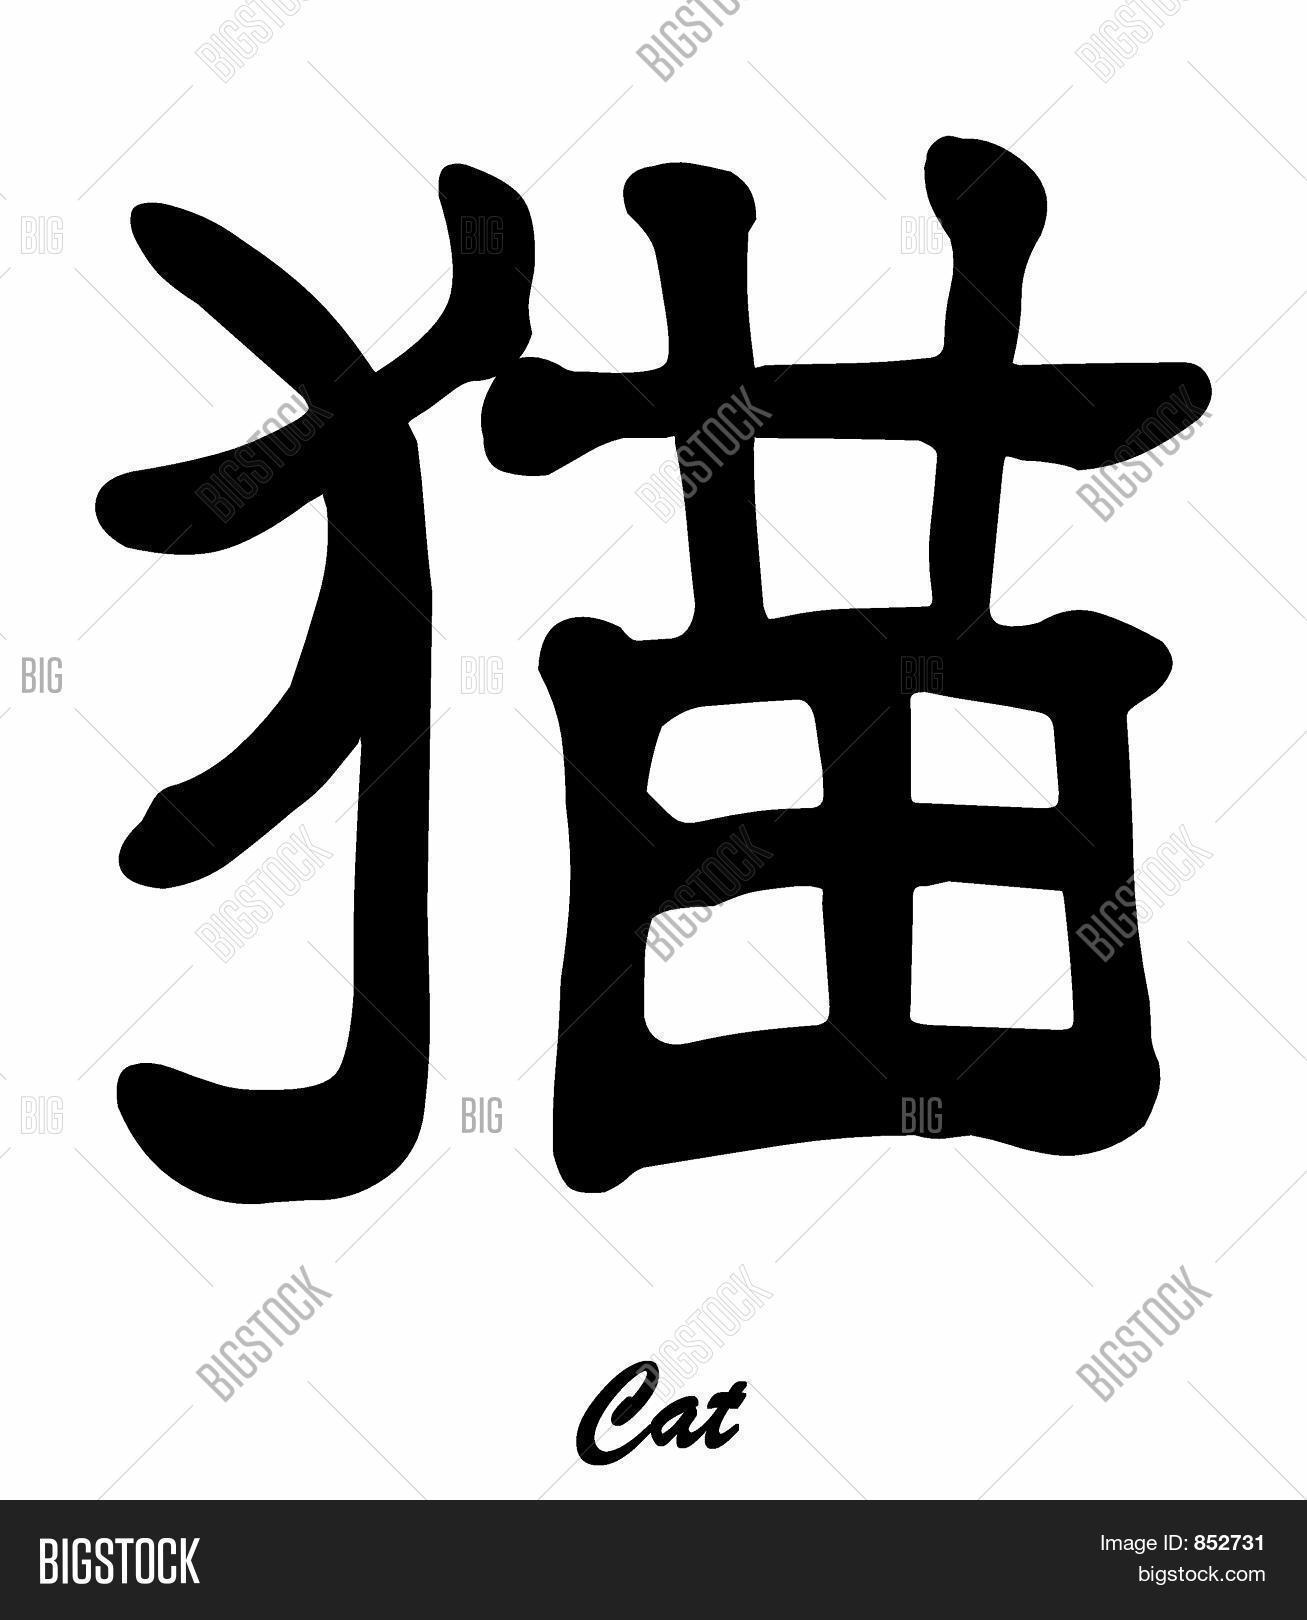 Cat Kitten Chinese Image Photo Free Trial Bigstock